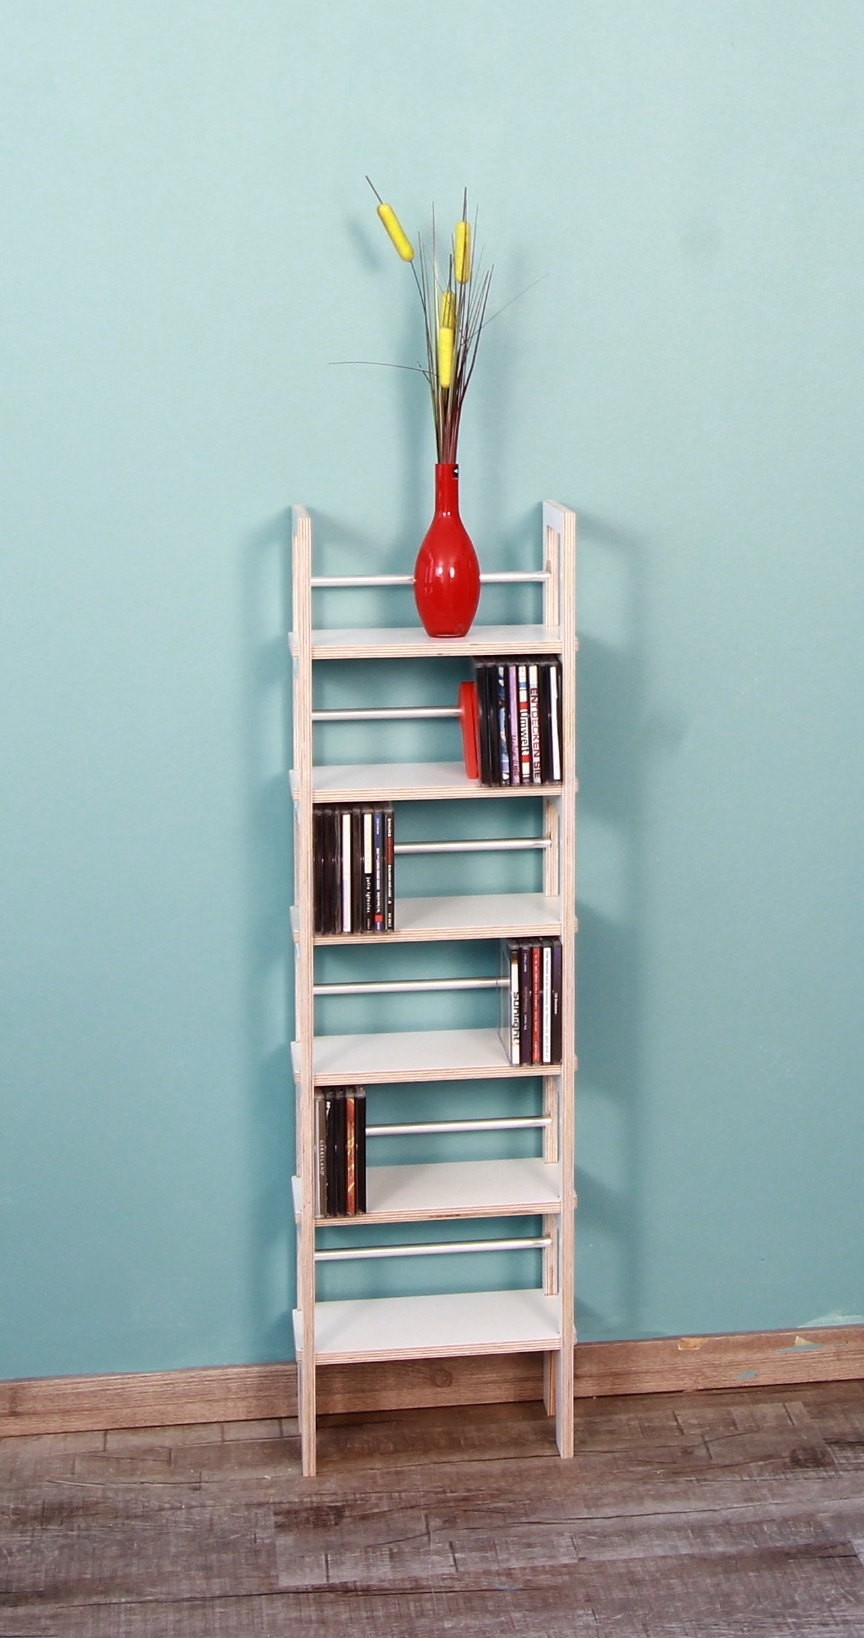 weisse regale interesting fileweie knigslilie lilium. Black Bedroom Furniture Sets. Home Design Ideas